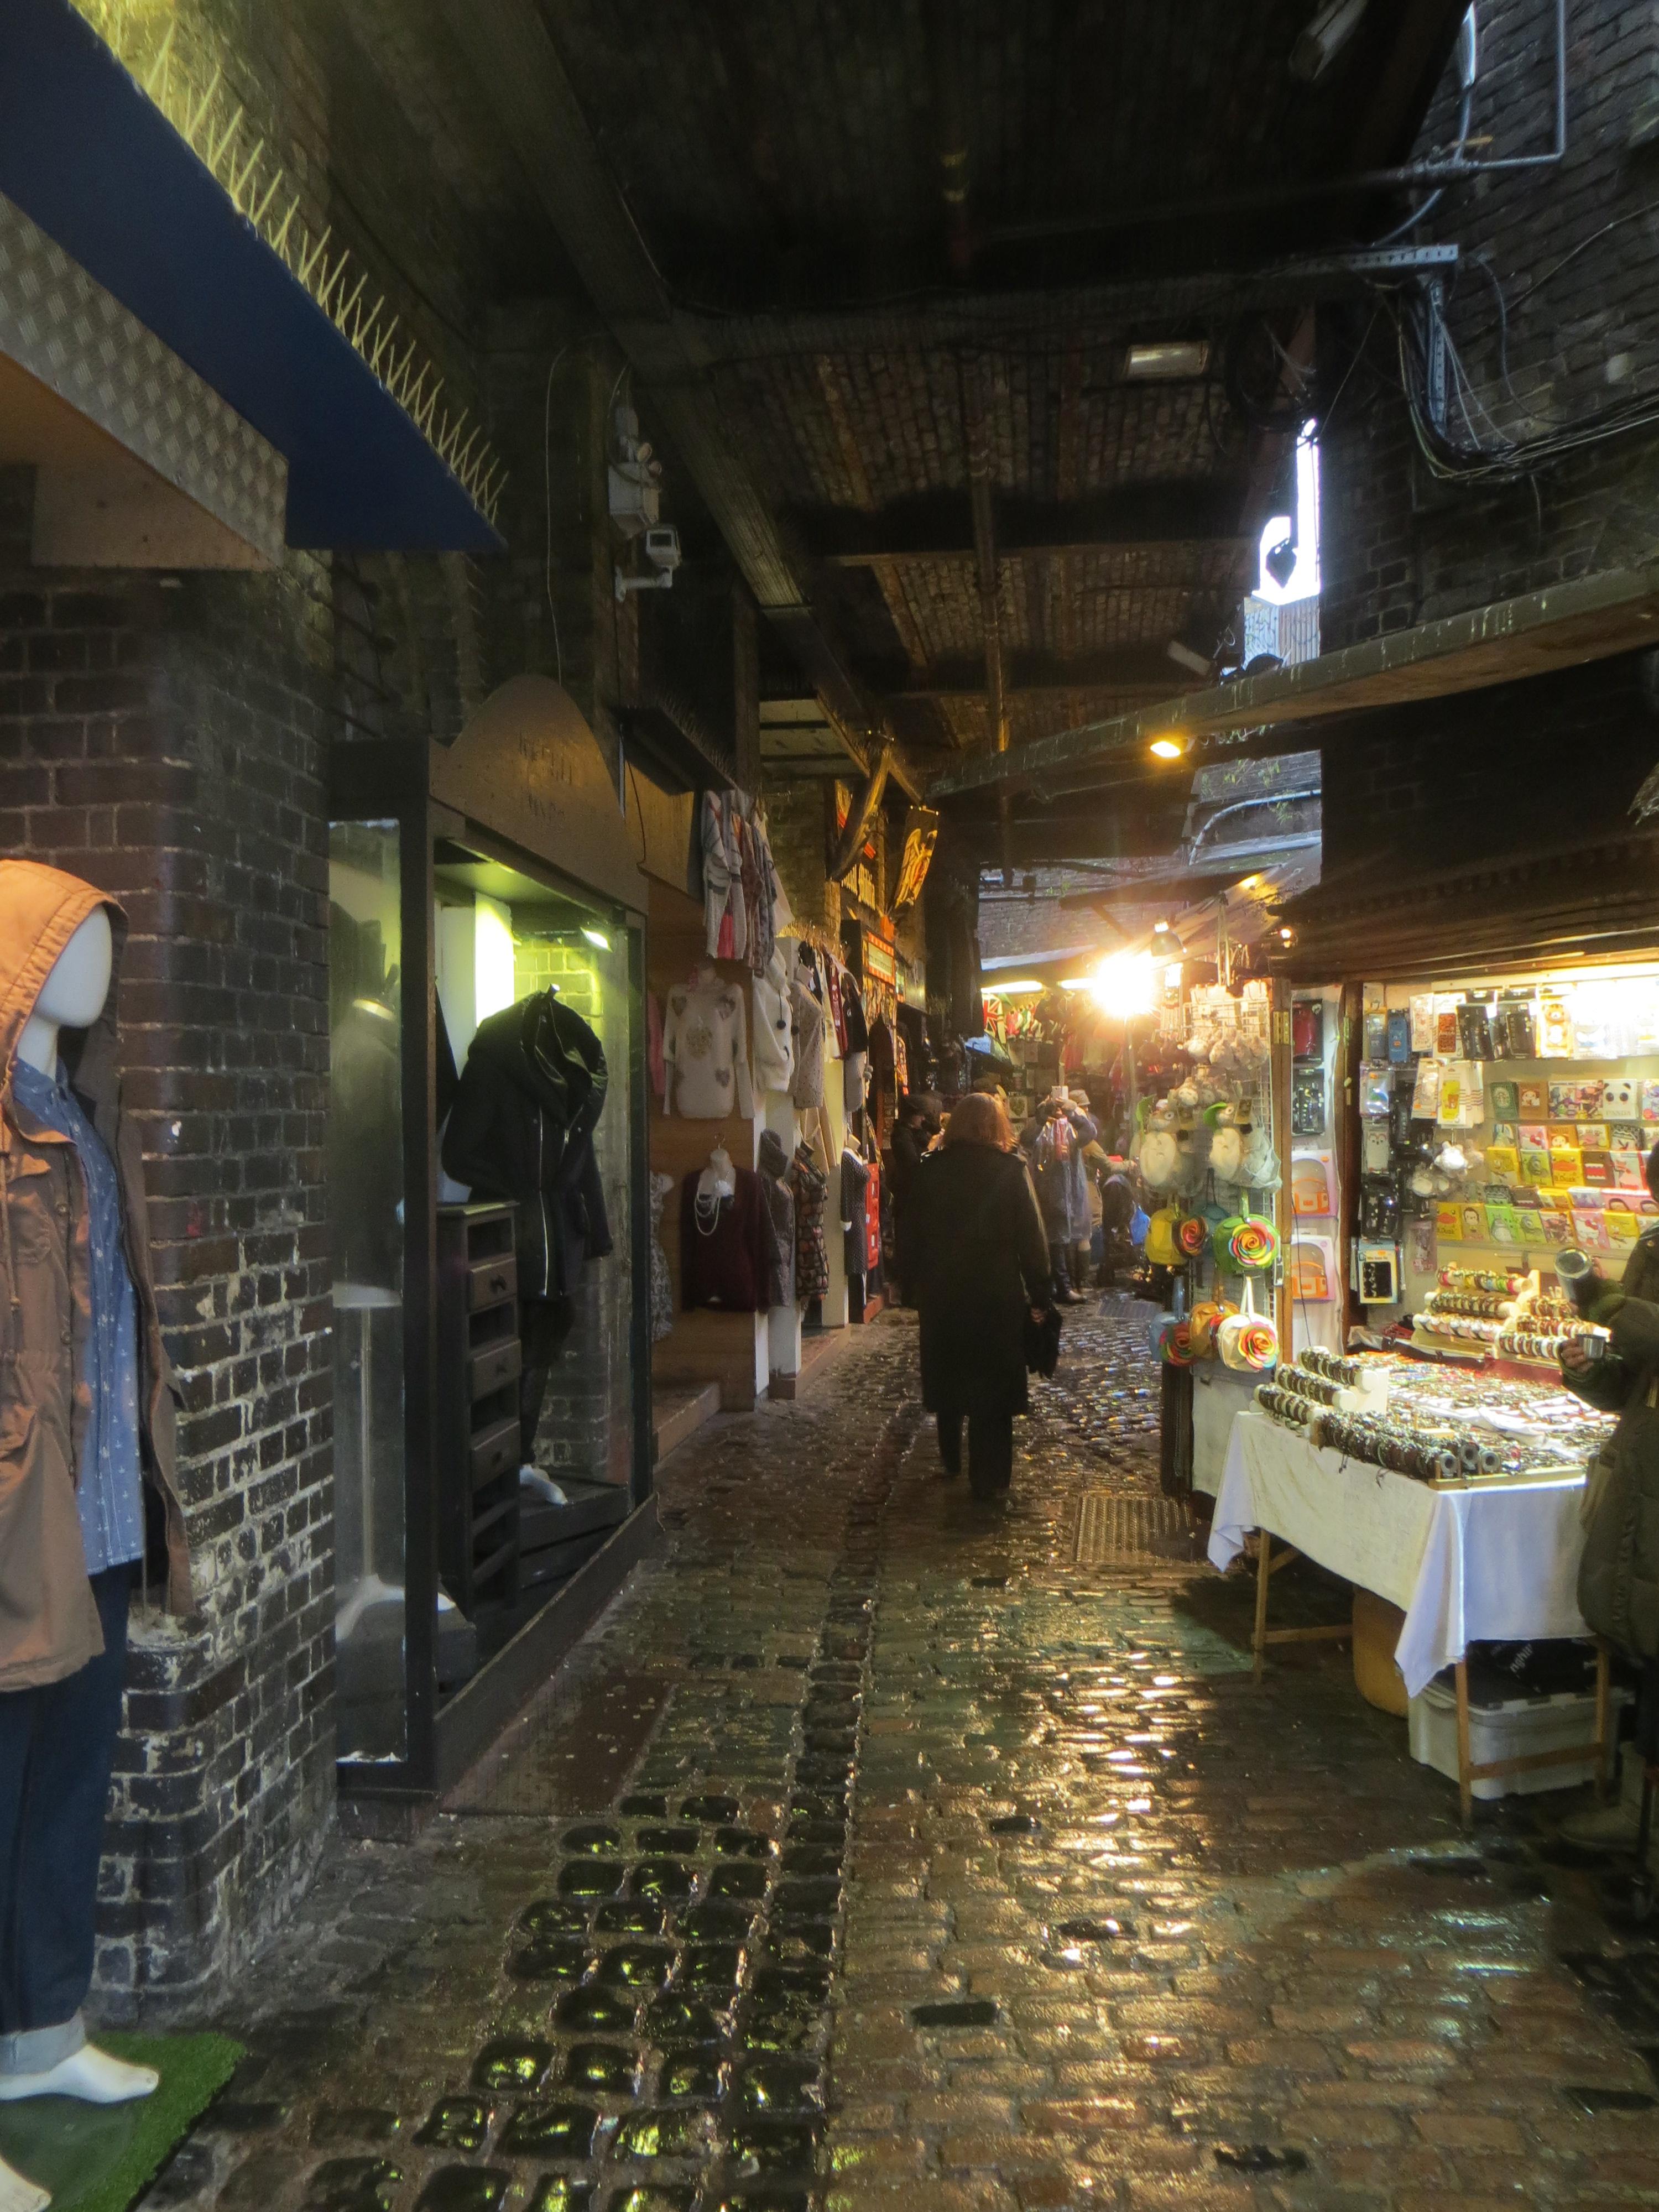 Camden Town: At Stables Market In Camden Town